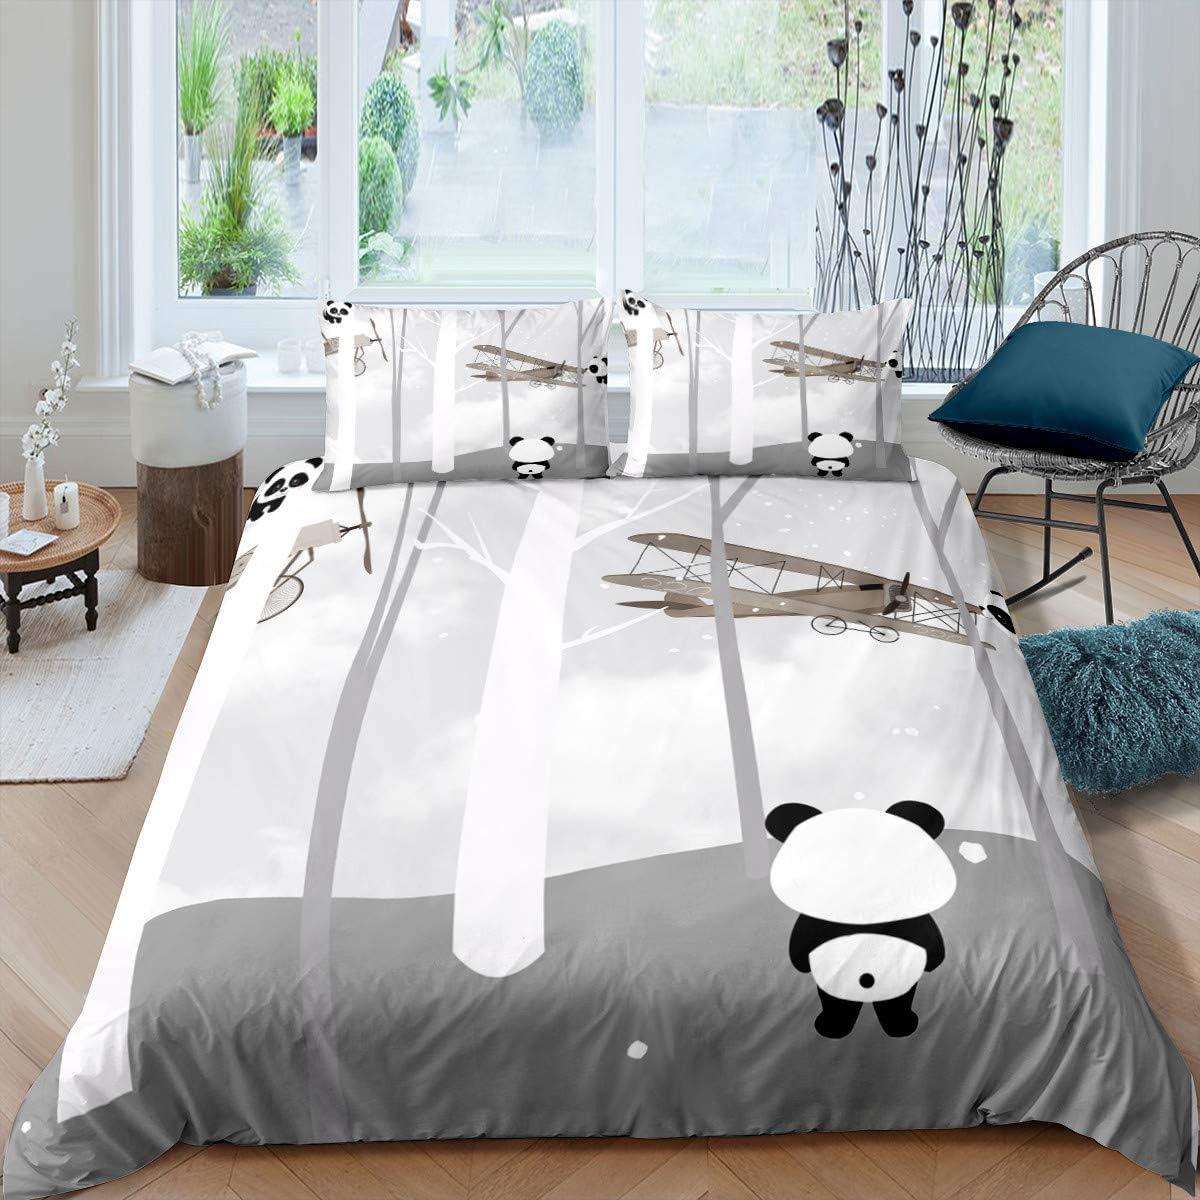 Lonely Panda Looking Aircrafts Duvet Sets Queen Cartoon Grey Panda Bear Bedding Cover Sets Grey Sky Trees 3 Pieces Comforter Sets(1 Duvet Cover 2 Pillow Cases)